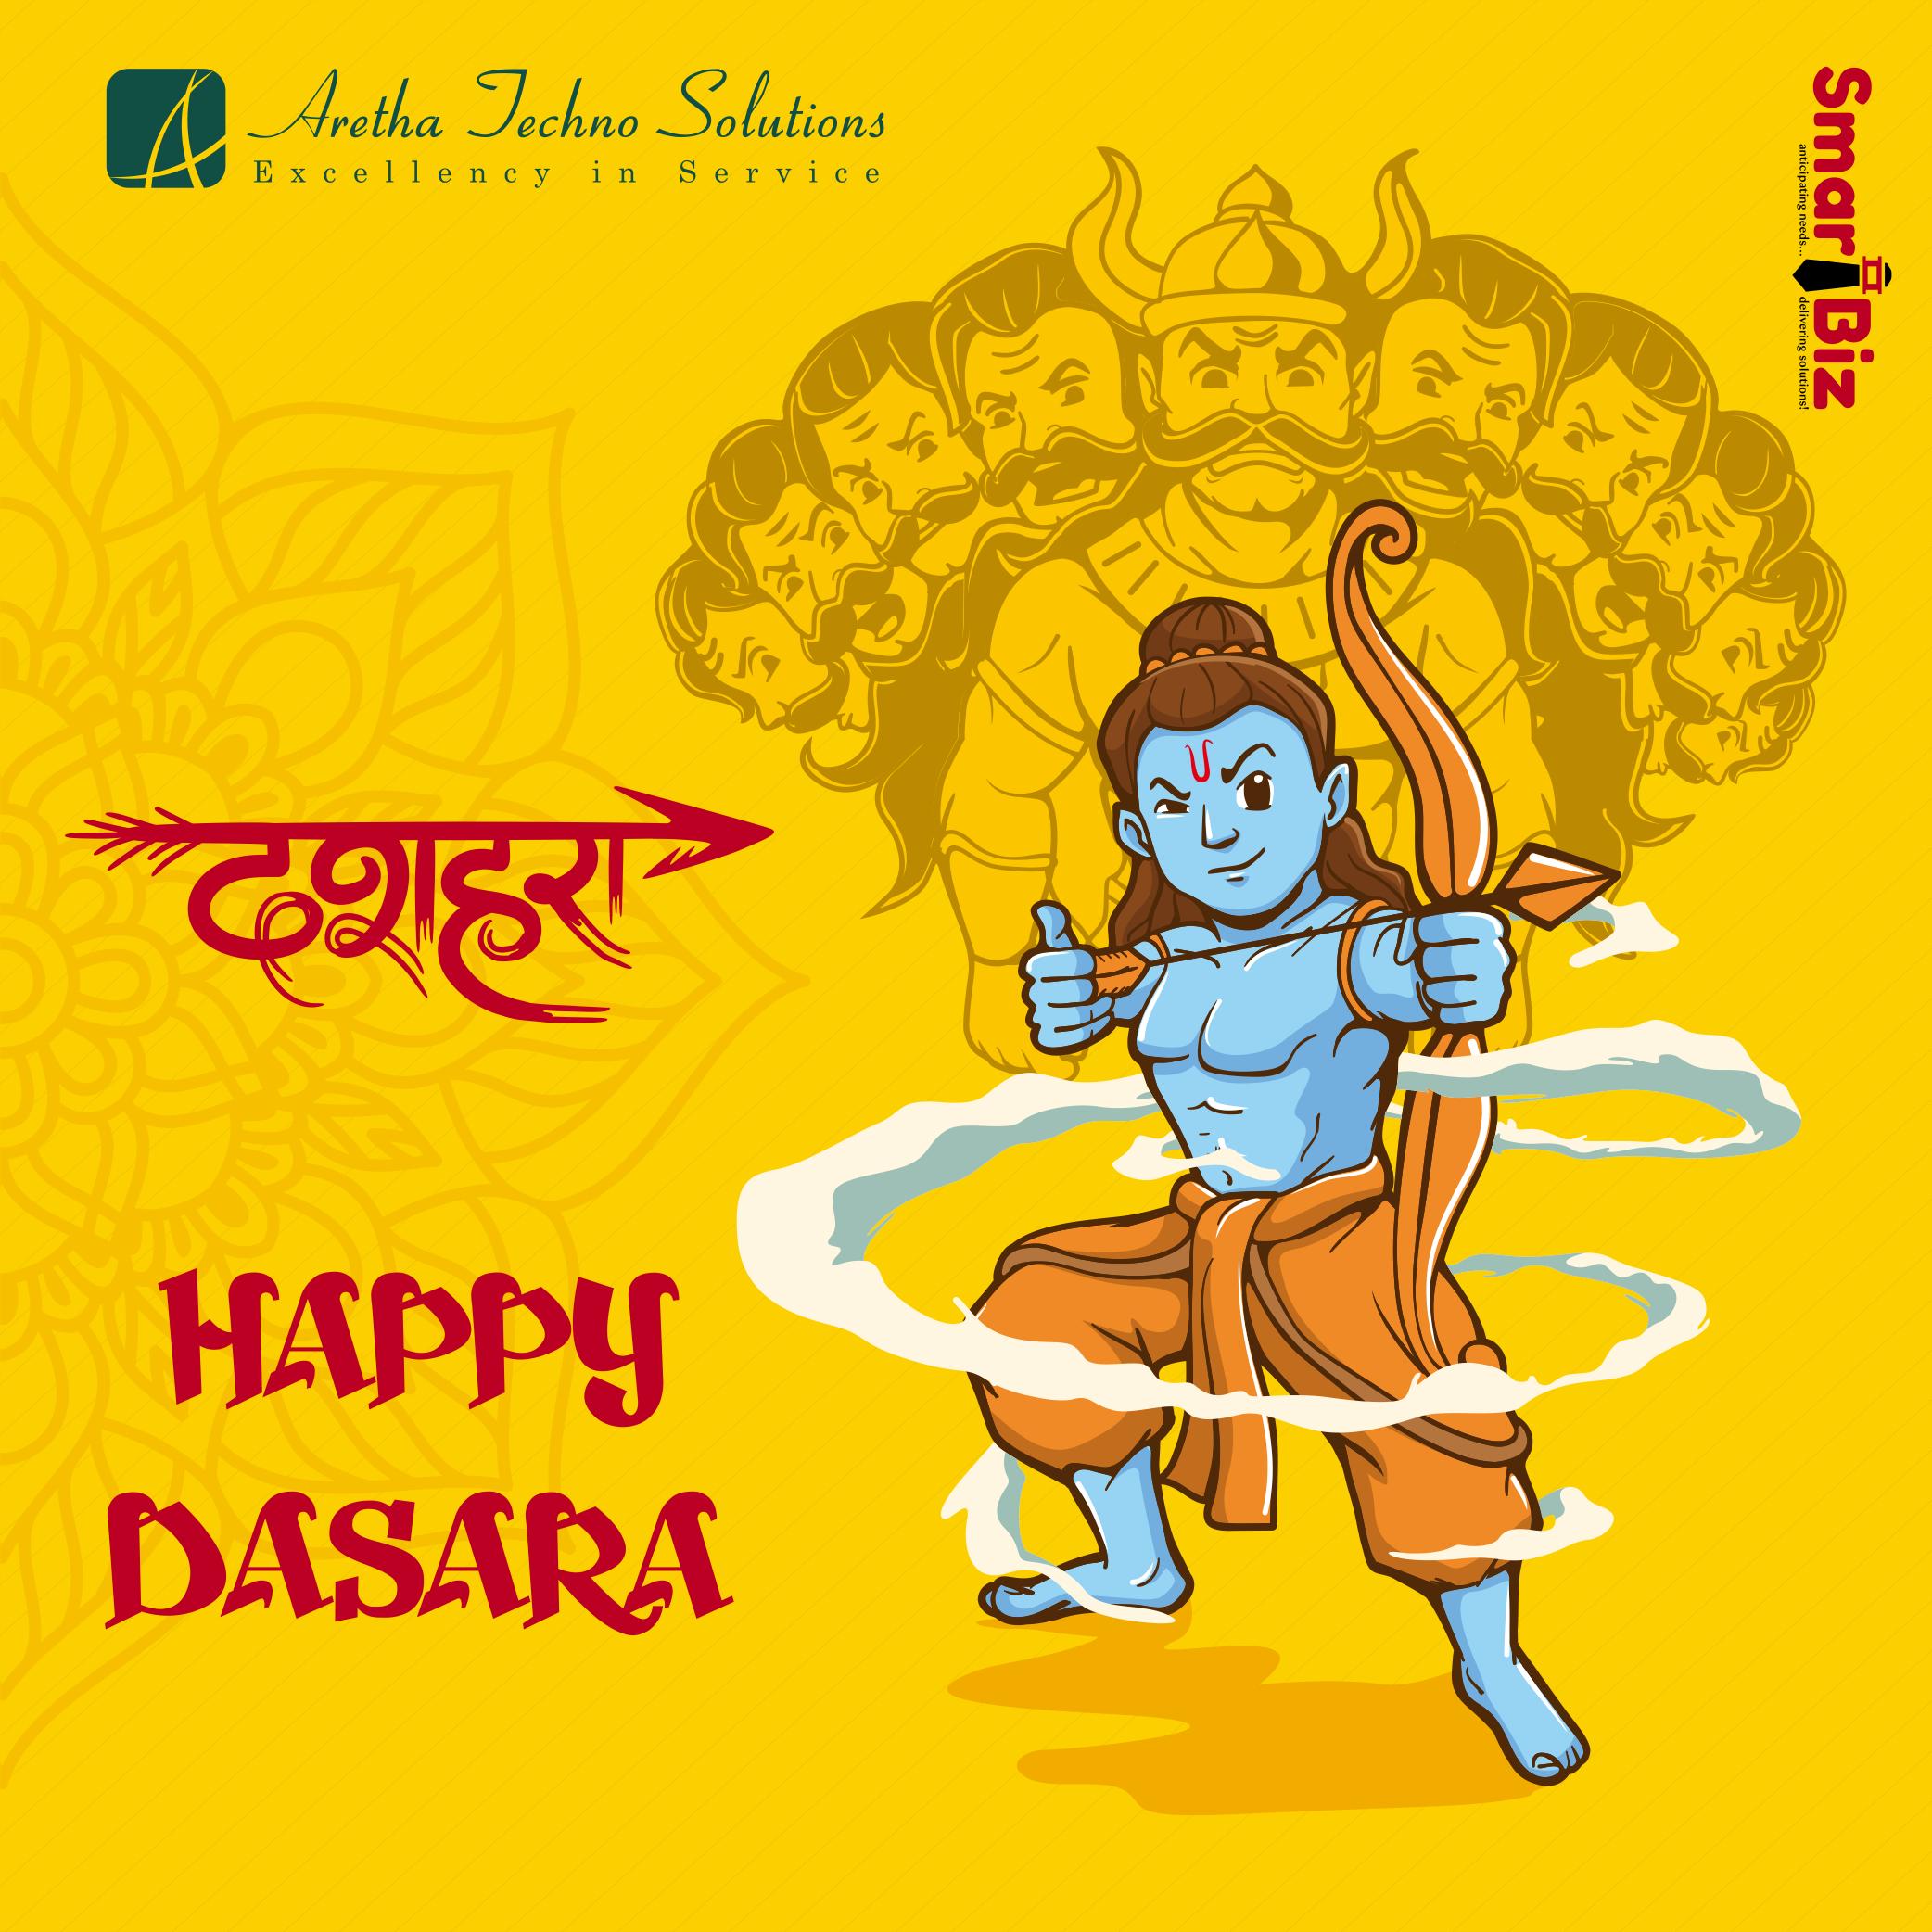 On this occasion of Dasara may god Durga blessings bring